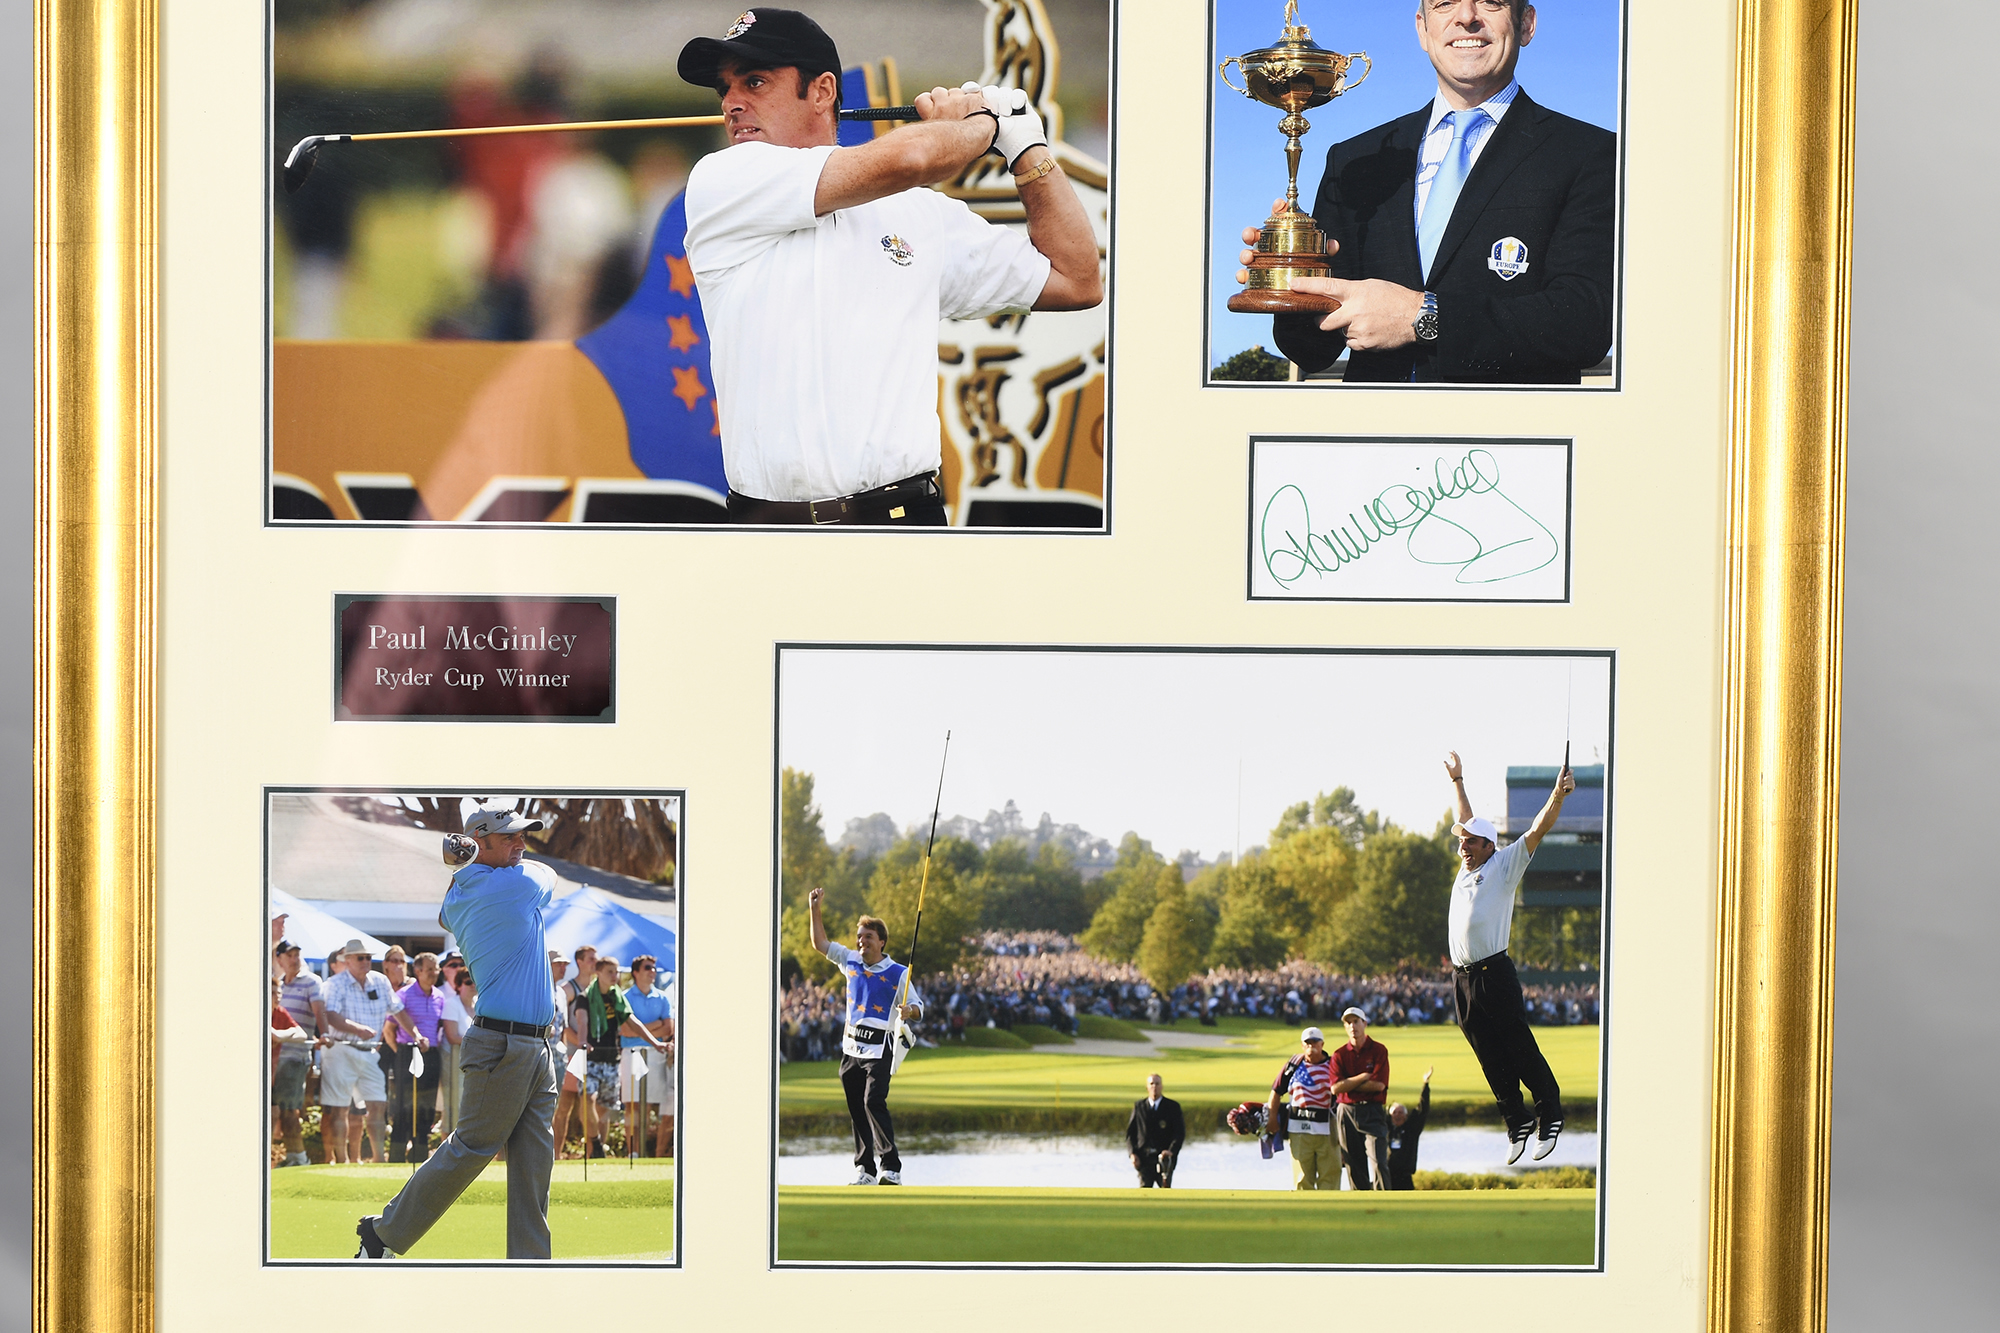 Paul Mcginley Framed Signature Presentation - Image 2 of 6